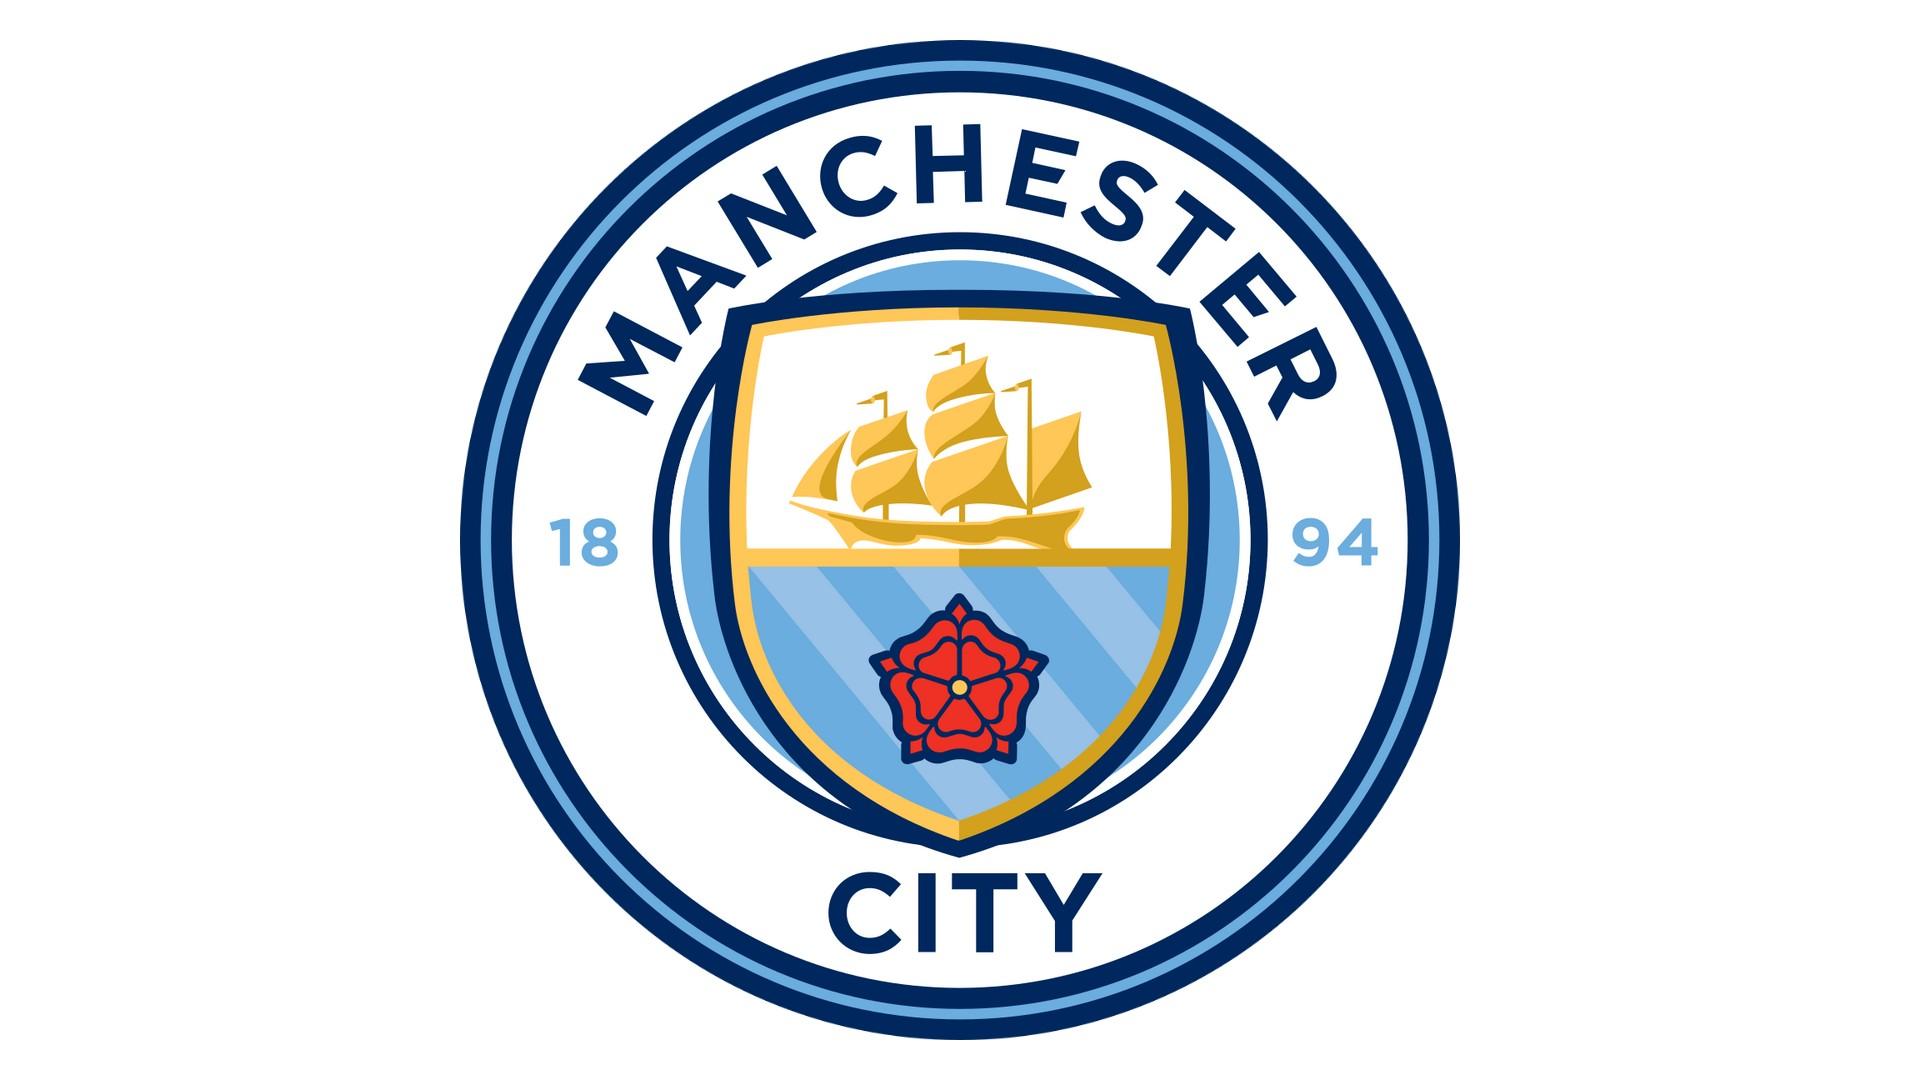 Football – Club Manchester City (1) Logo